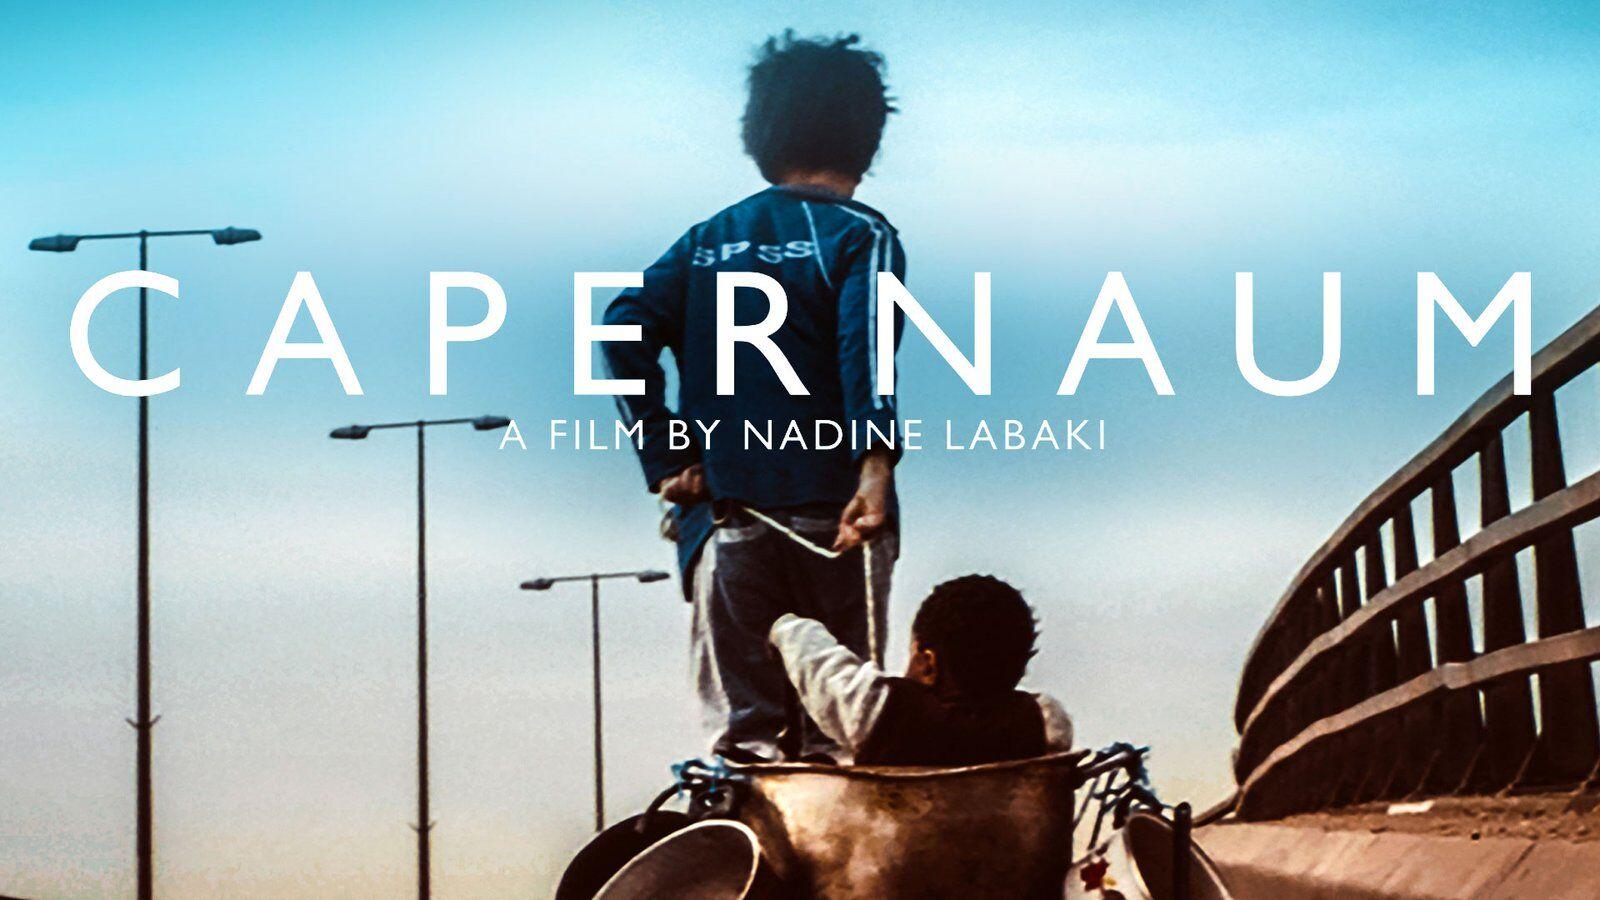 capernaum Capernaum – Cannes Film Festival Jury Prize e820a438 e2fd 4cfc 81c5 dbef691224c1